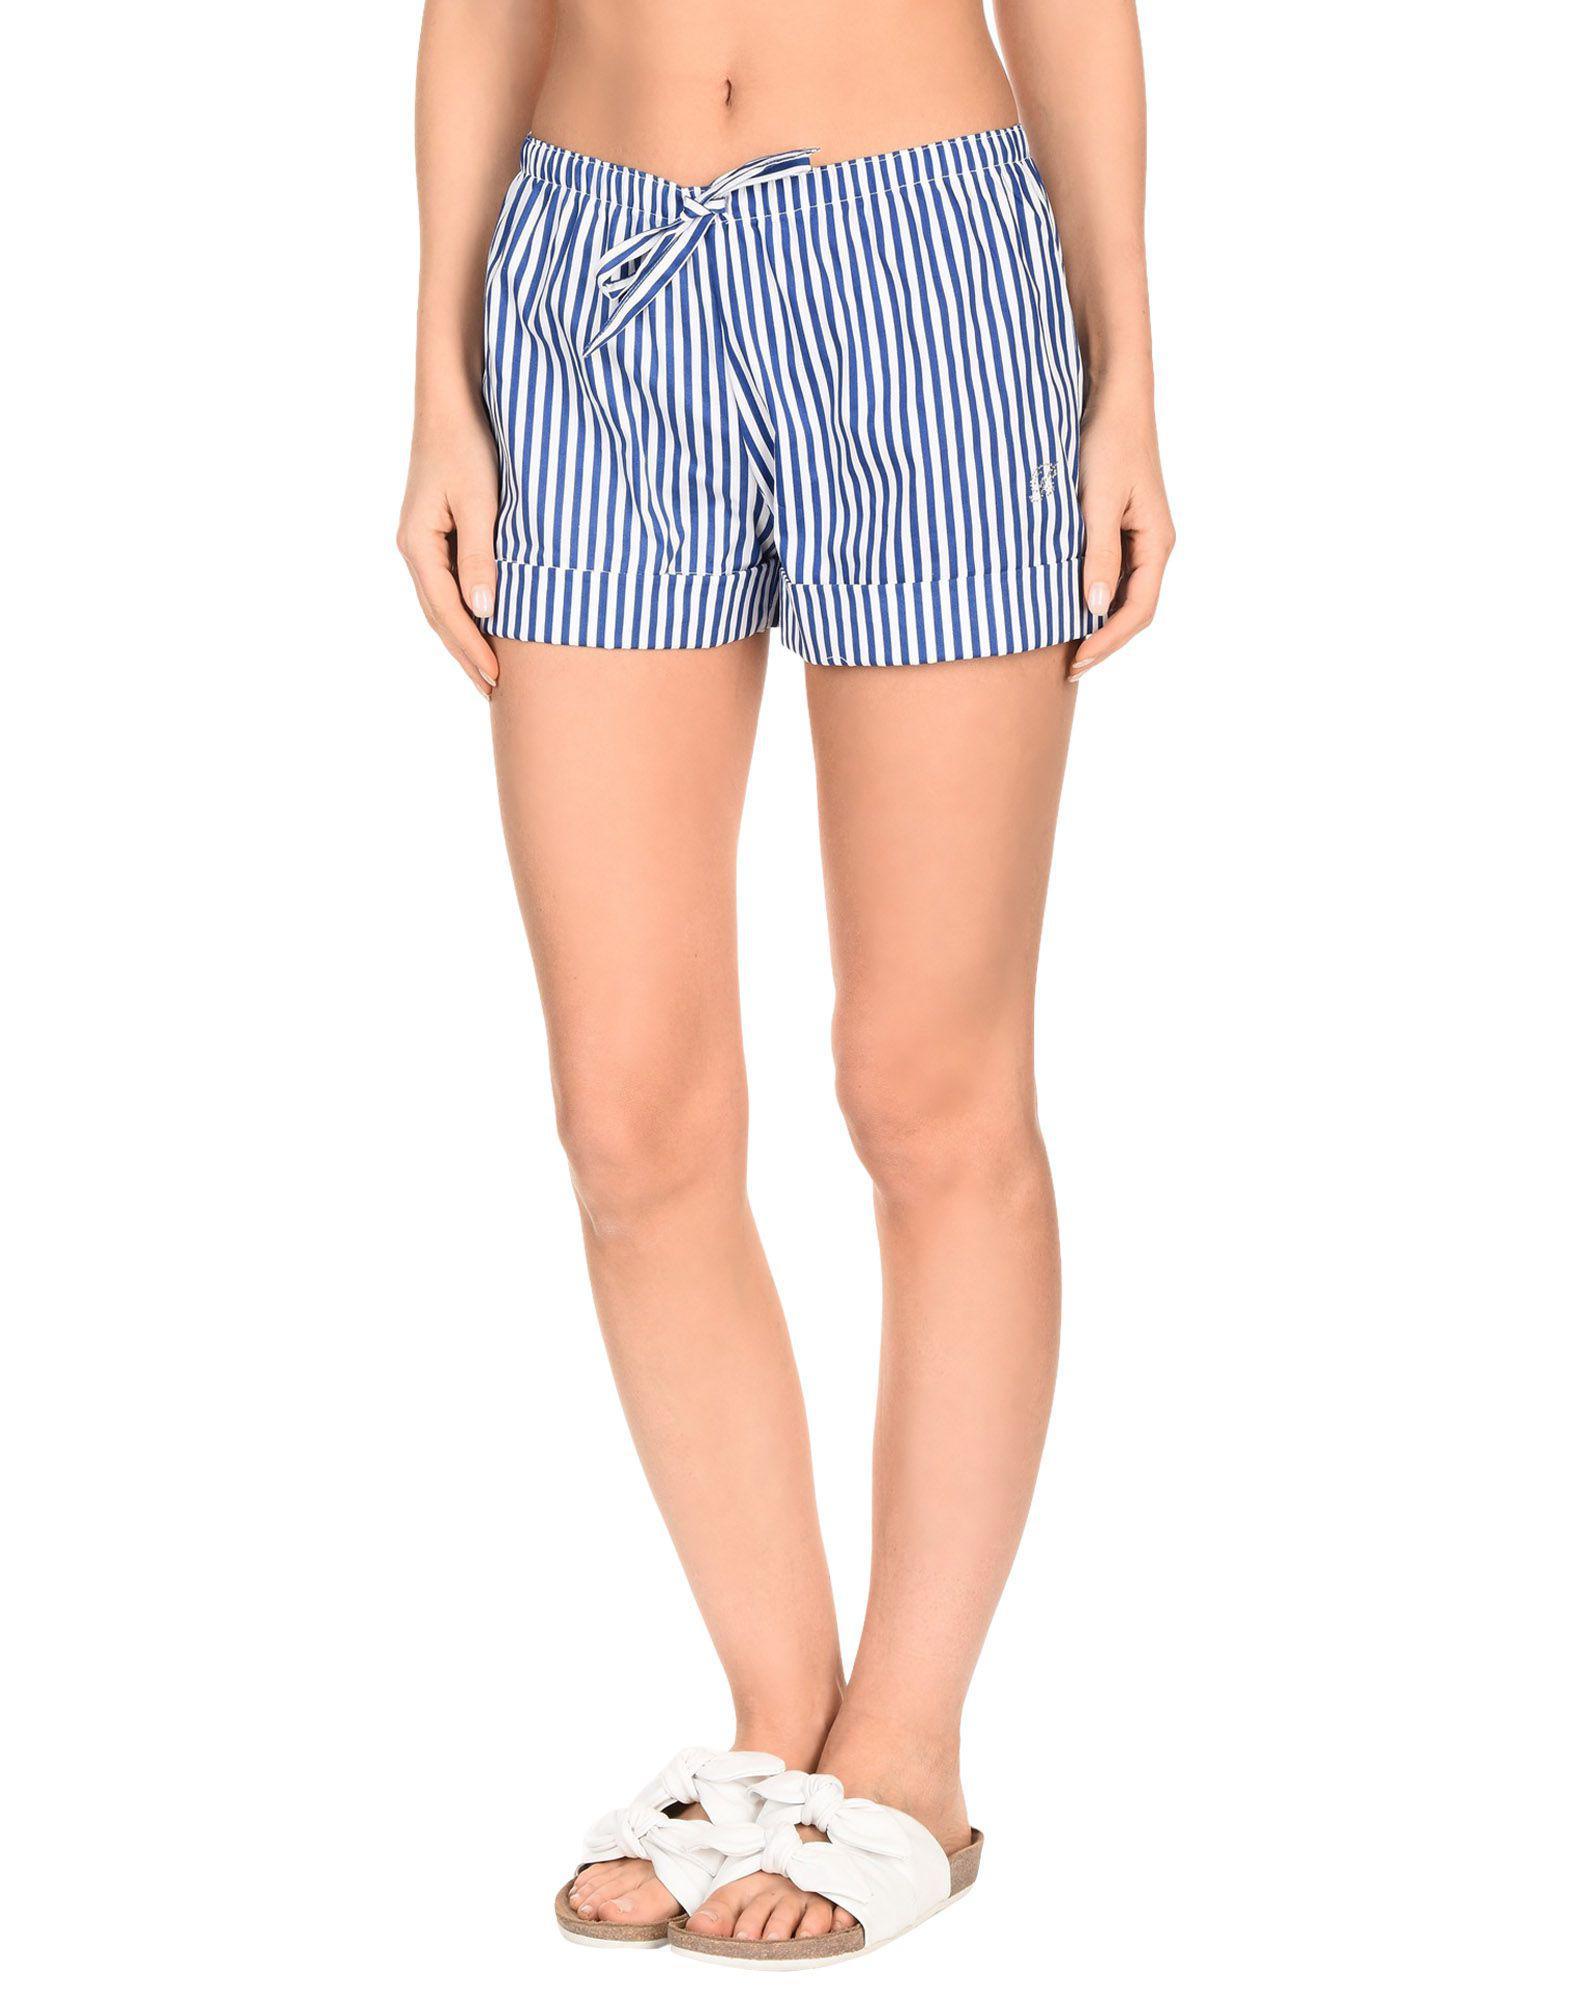 SWIMWEAR - Beach shorts and trousers Fisico elBaGTP